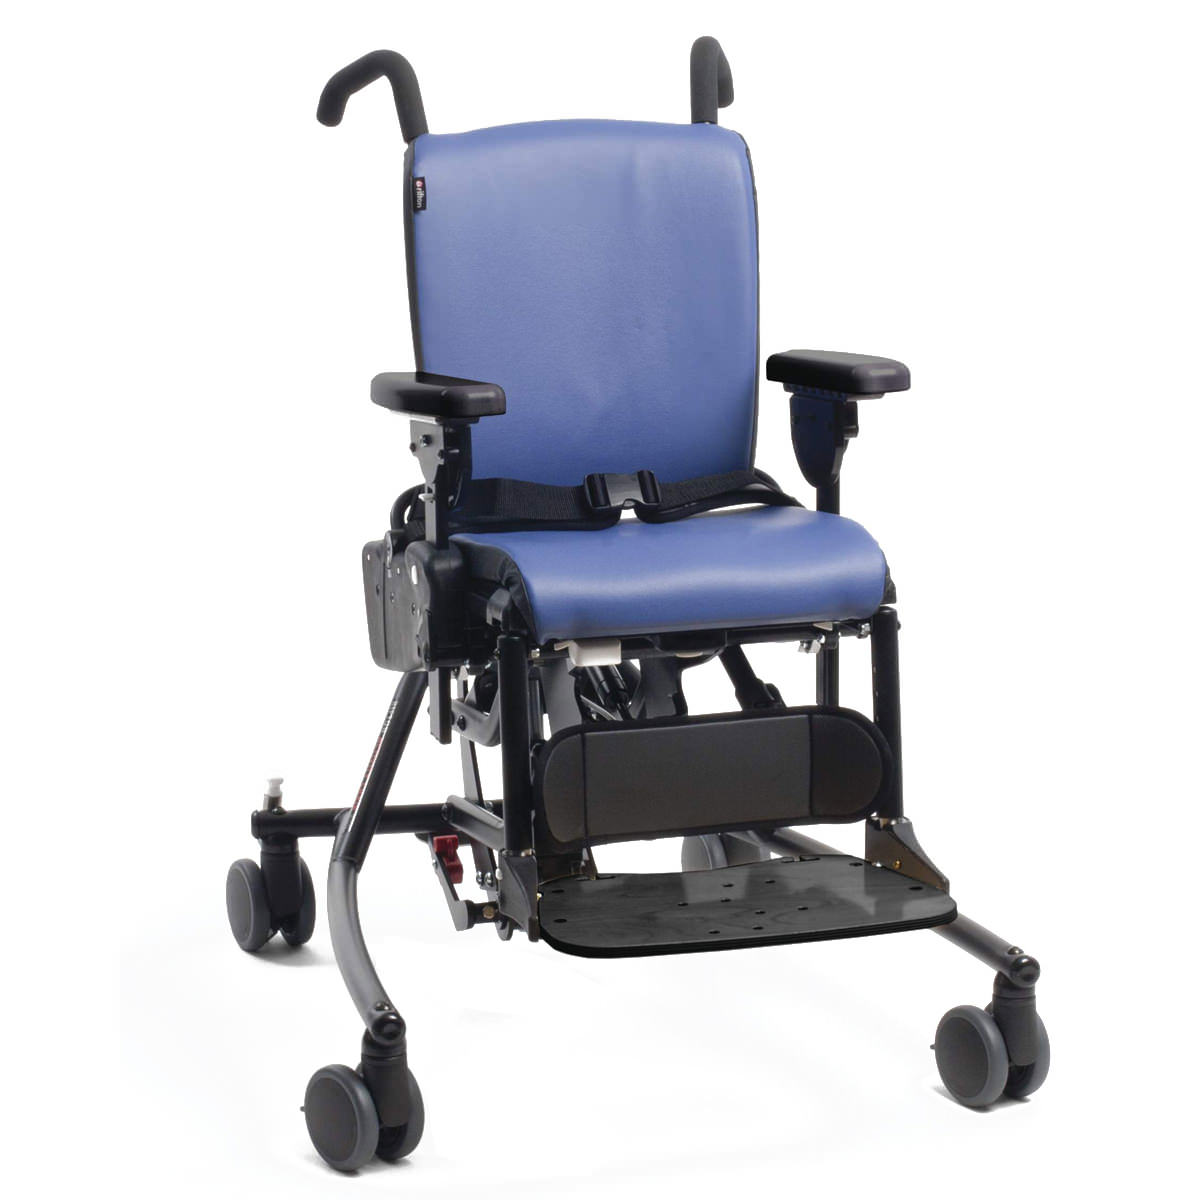 Rifton medium activity chair with hi-lo base